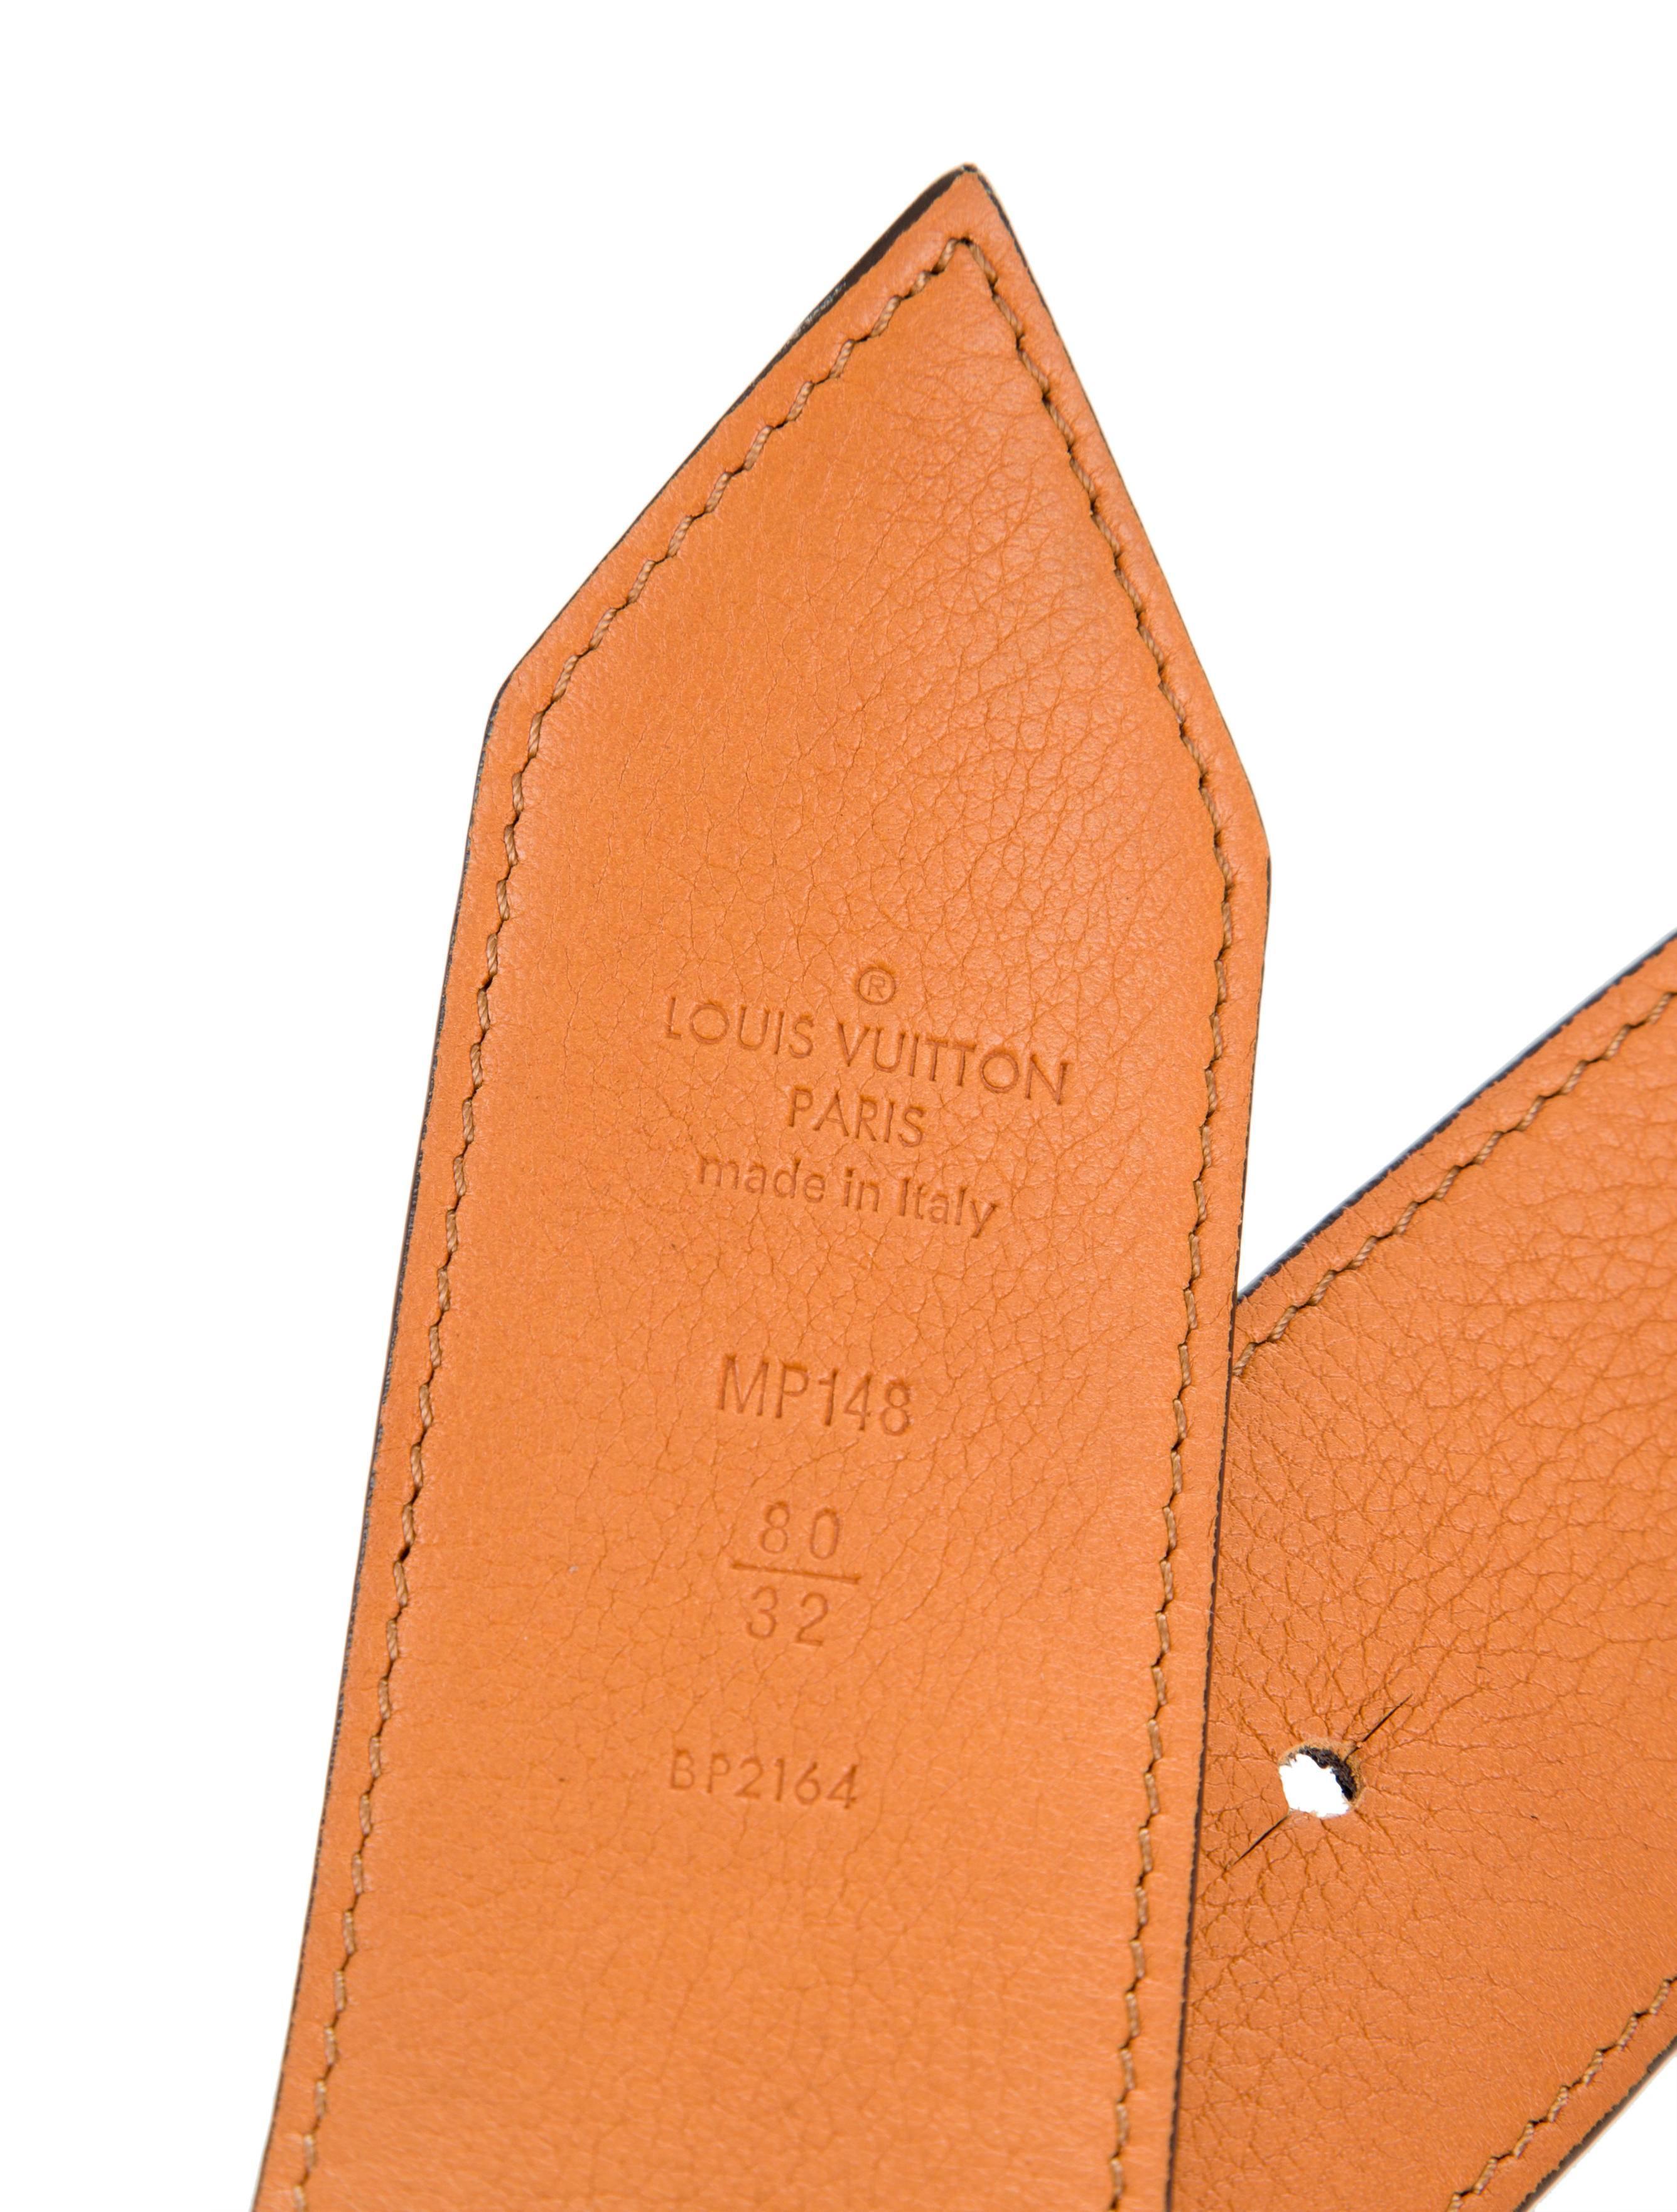 4856a1ef0 Louis Vuitton Rare Monogram Canvas Gold Hardware Sash Waist Belt at 1stdibs